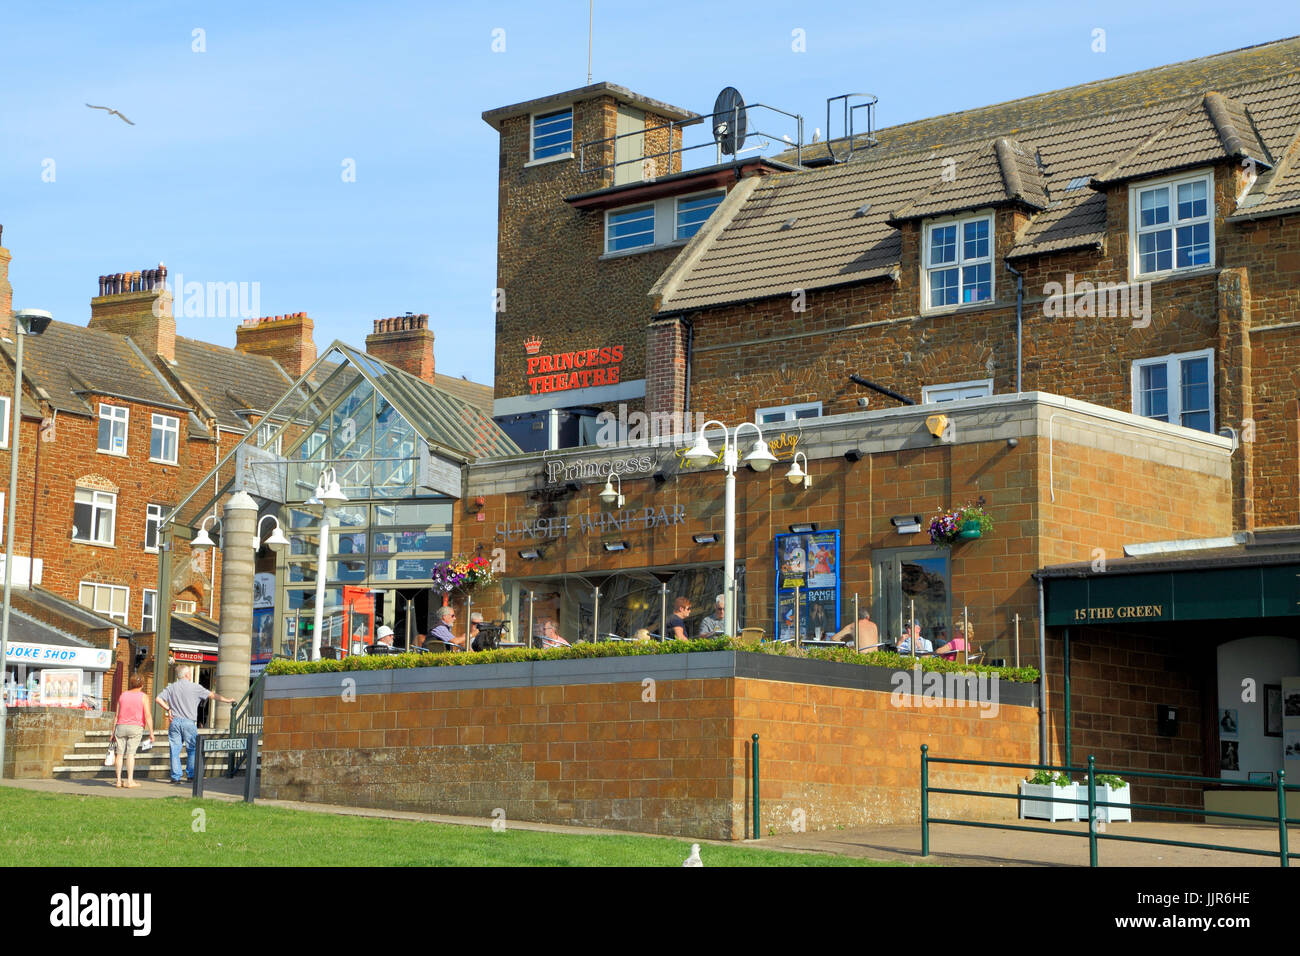 Princess Theatre, Terrace Bar, Sunset Wine Bar, Hunstanton, Norfolk, England, UK - Stock Image